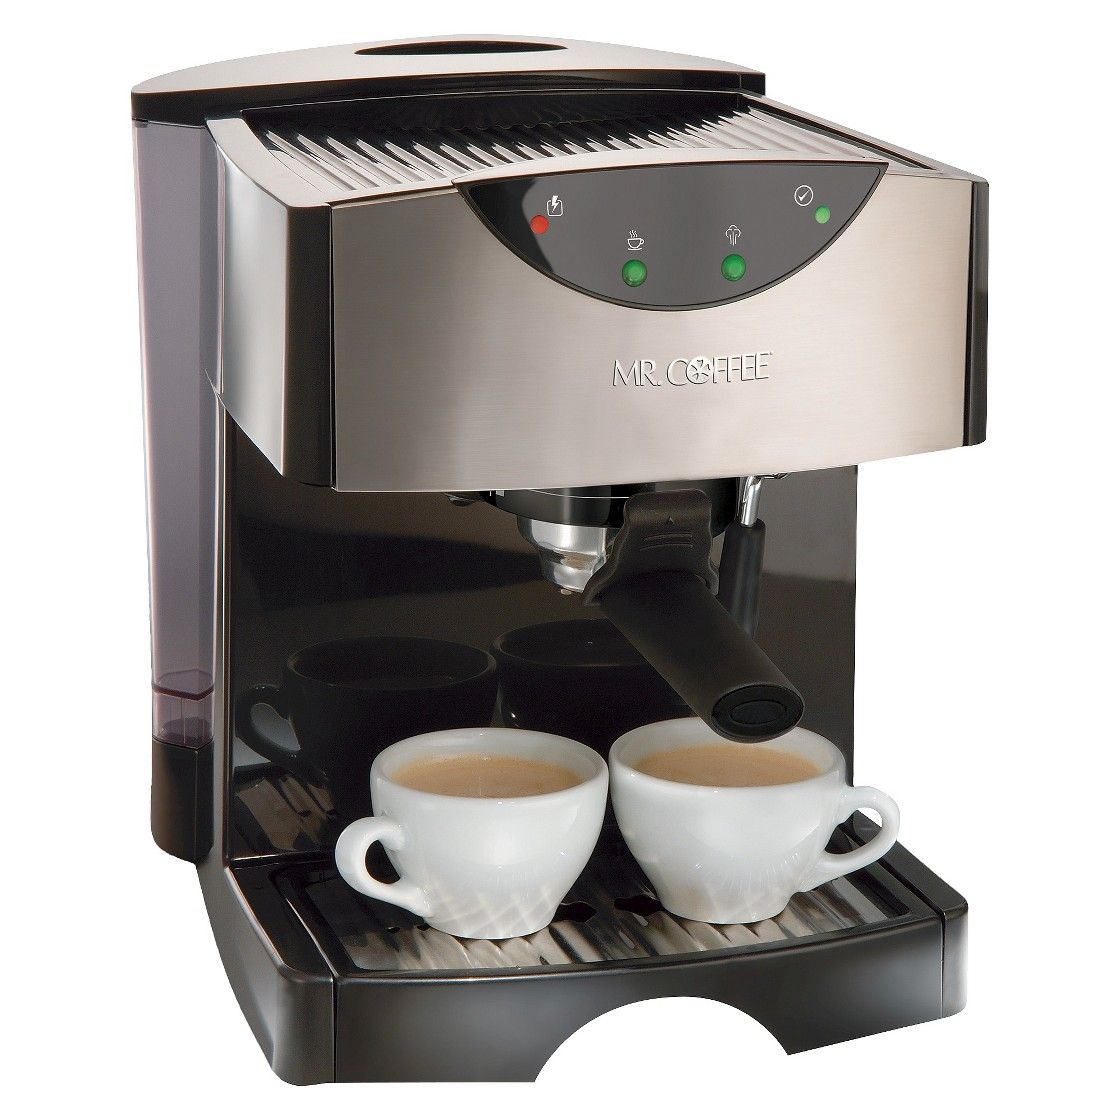 Mr. Coffee Pump Espresso Maker - Black